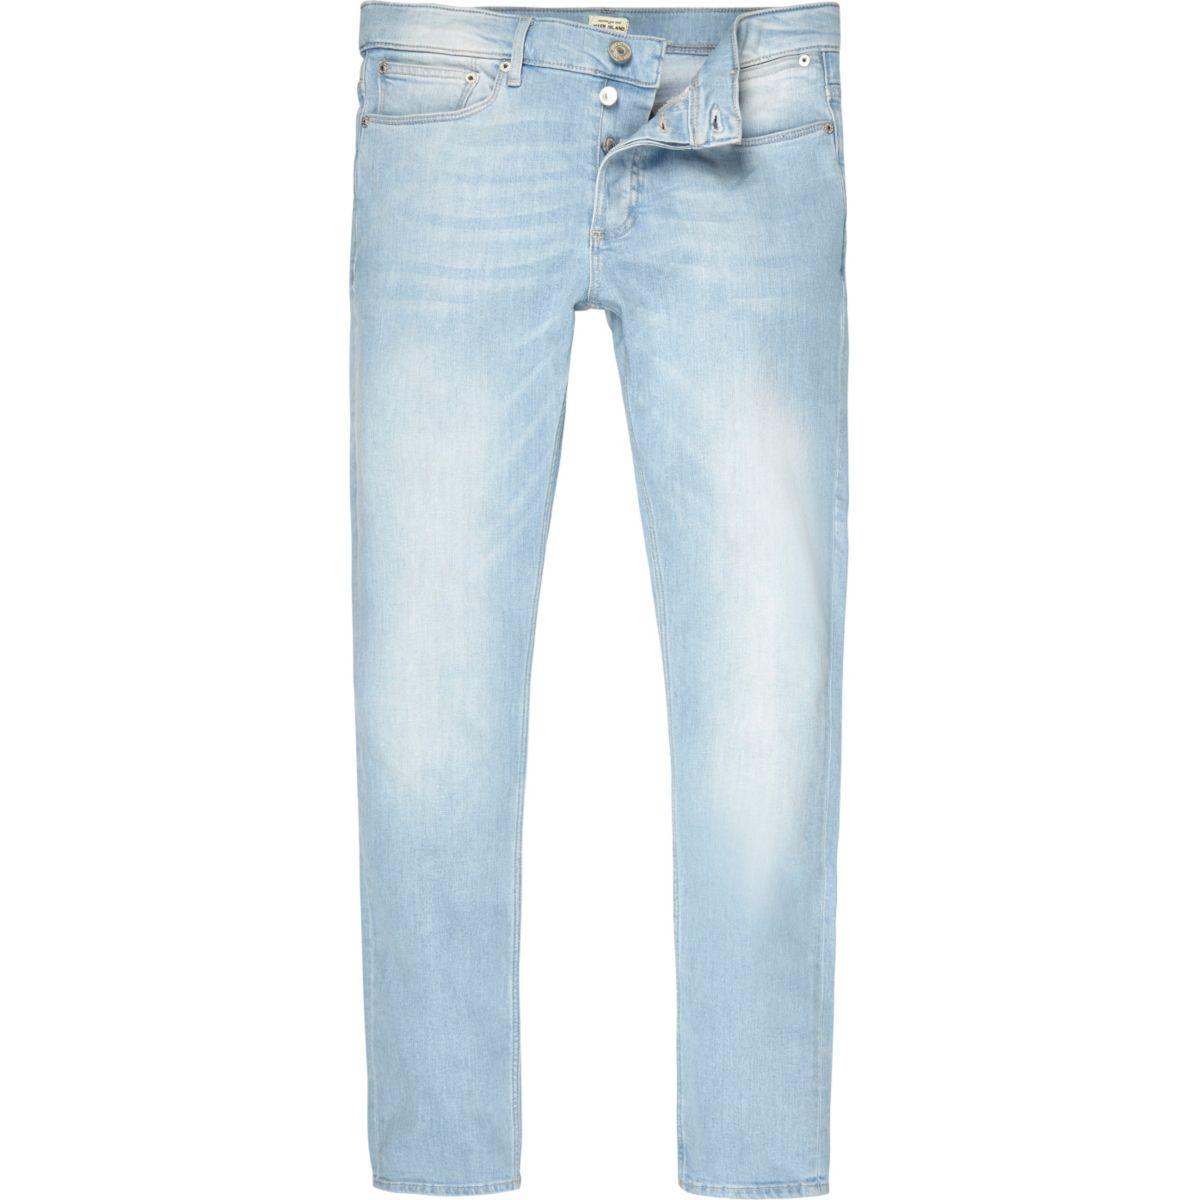 Light blue wash Sid skinny jeans